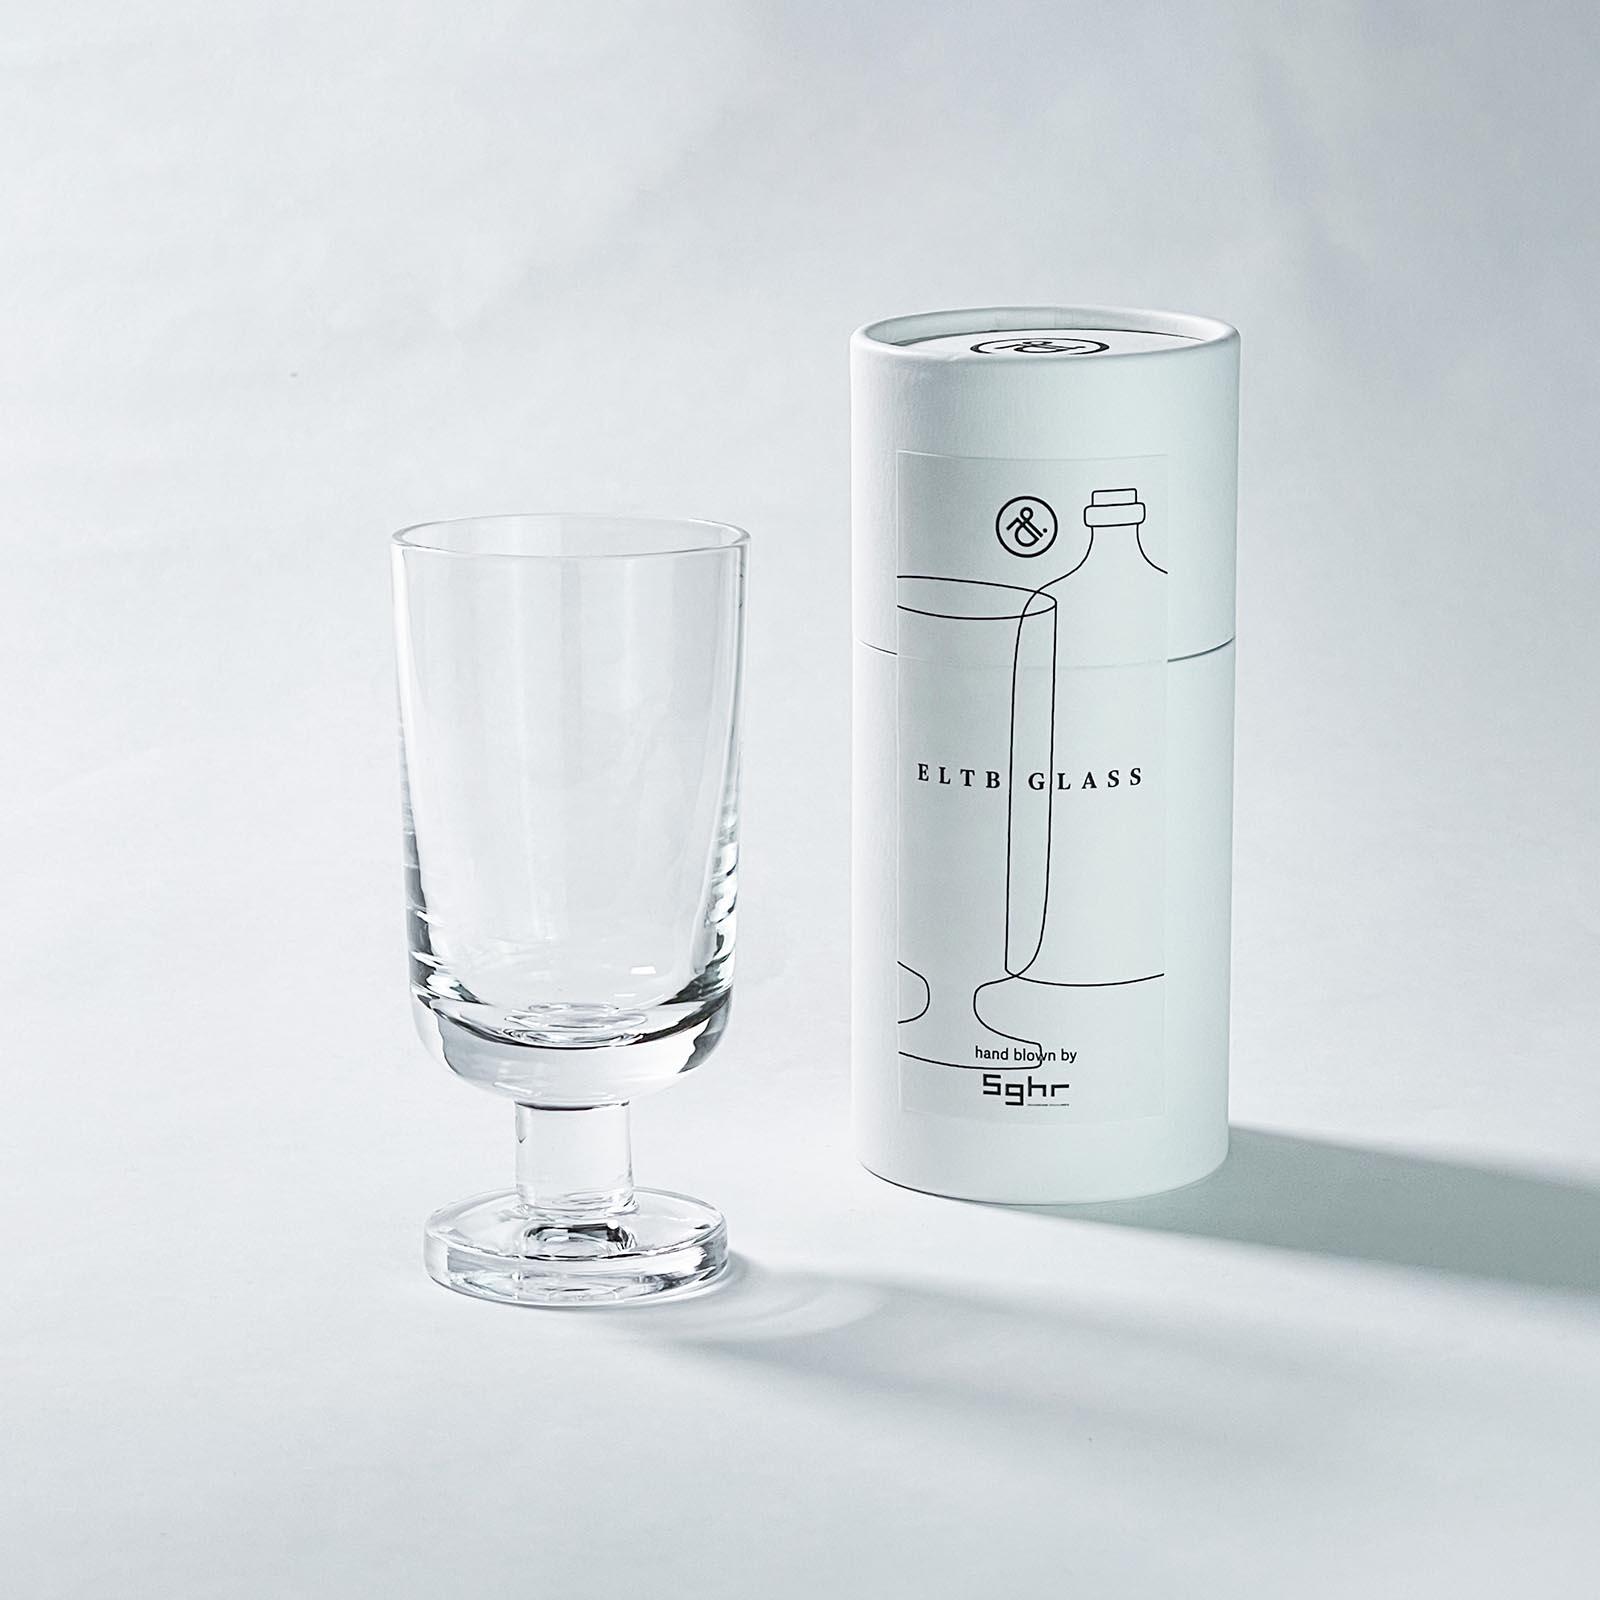 mitosaya × Sghr:蒸留酒 MELLOW UMEBOSHI 1本+ELTB GLASS 1客 セット GIFT